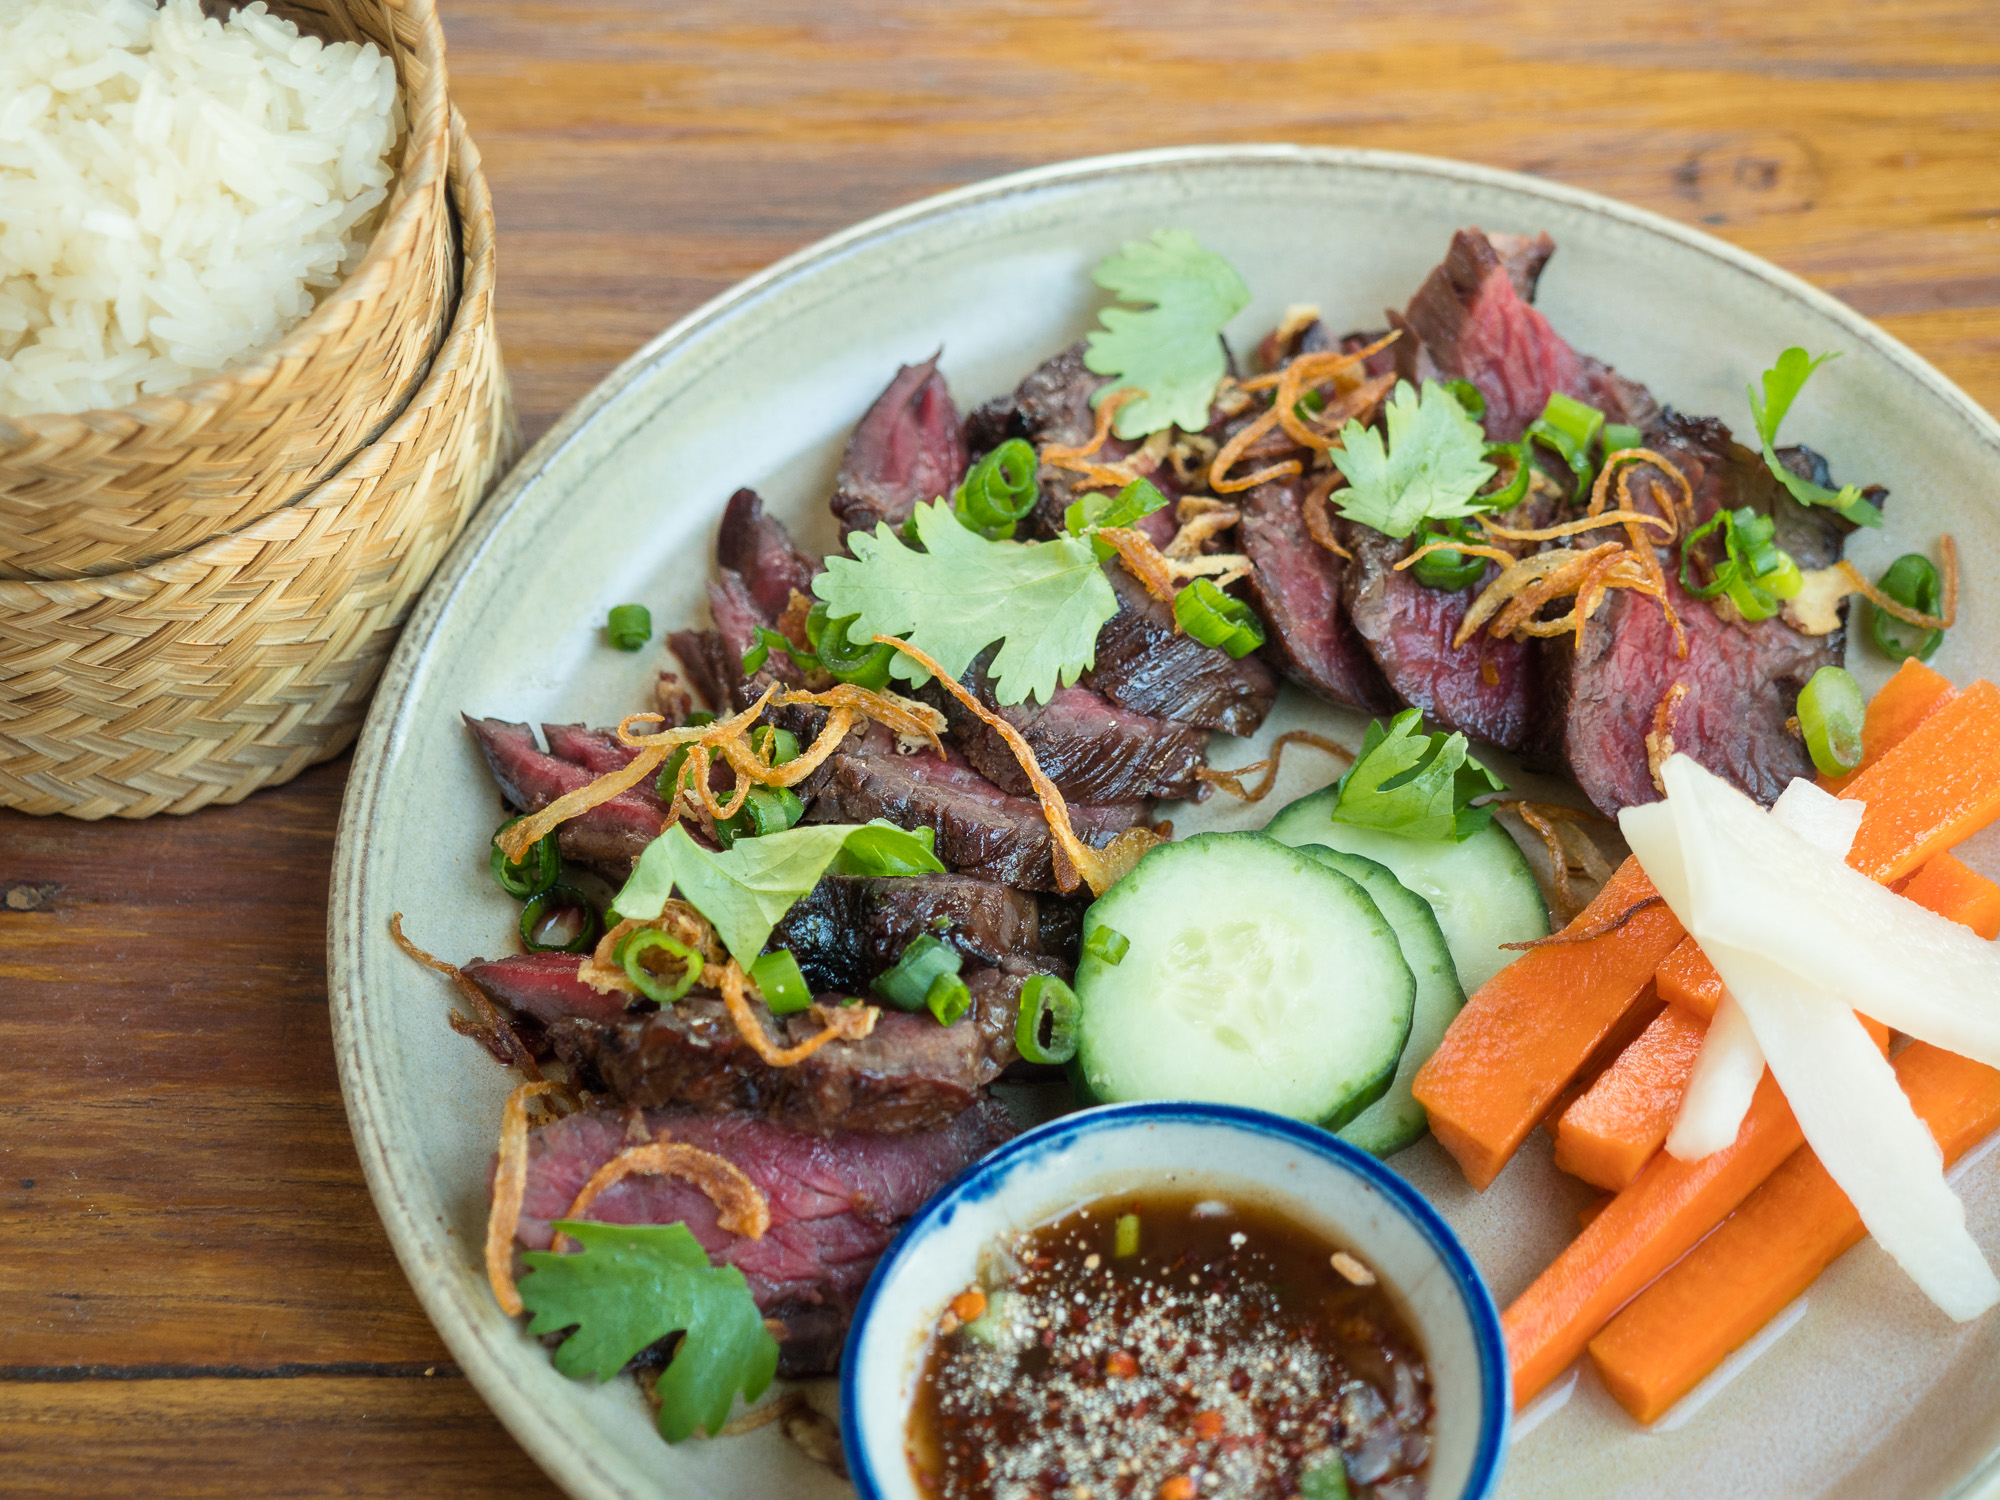 6 paadee portland pdx food photo photography styling foodie thai jeremy pawlowski eats eatsportland eatsamerica cheap